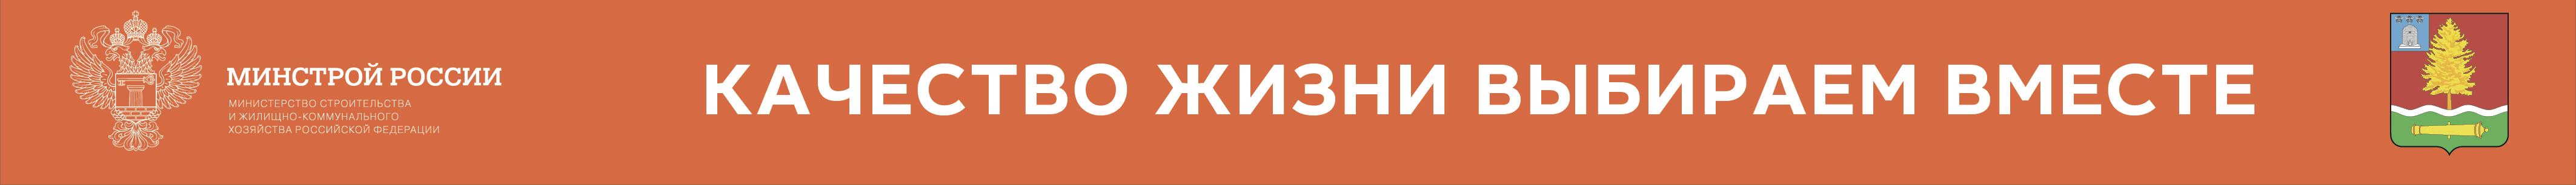 gorodkotovsk.ru